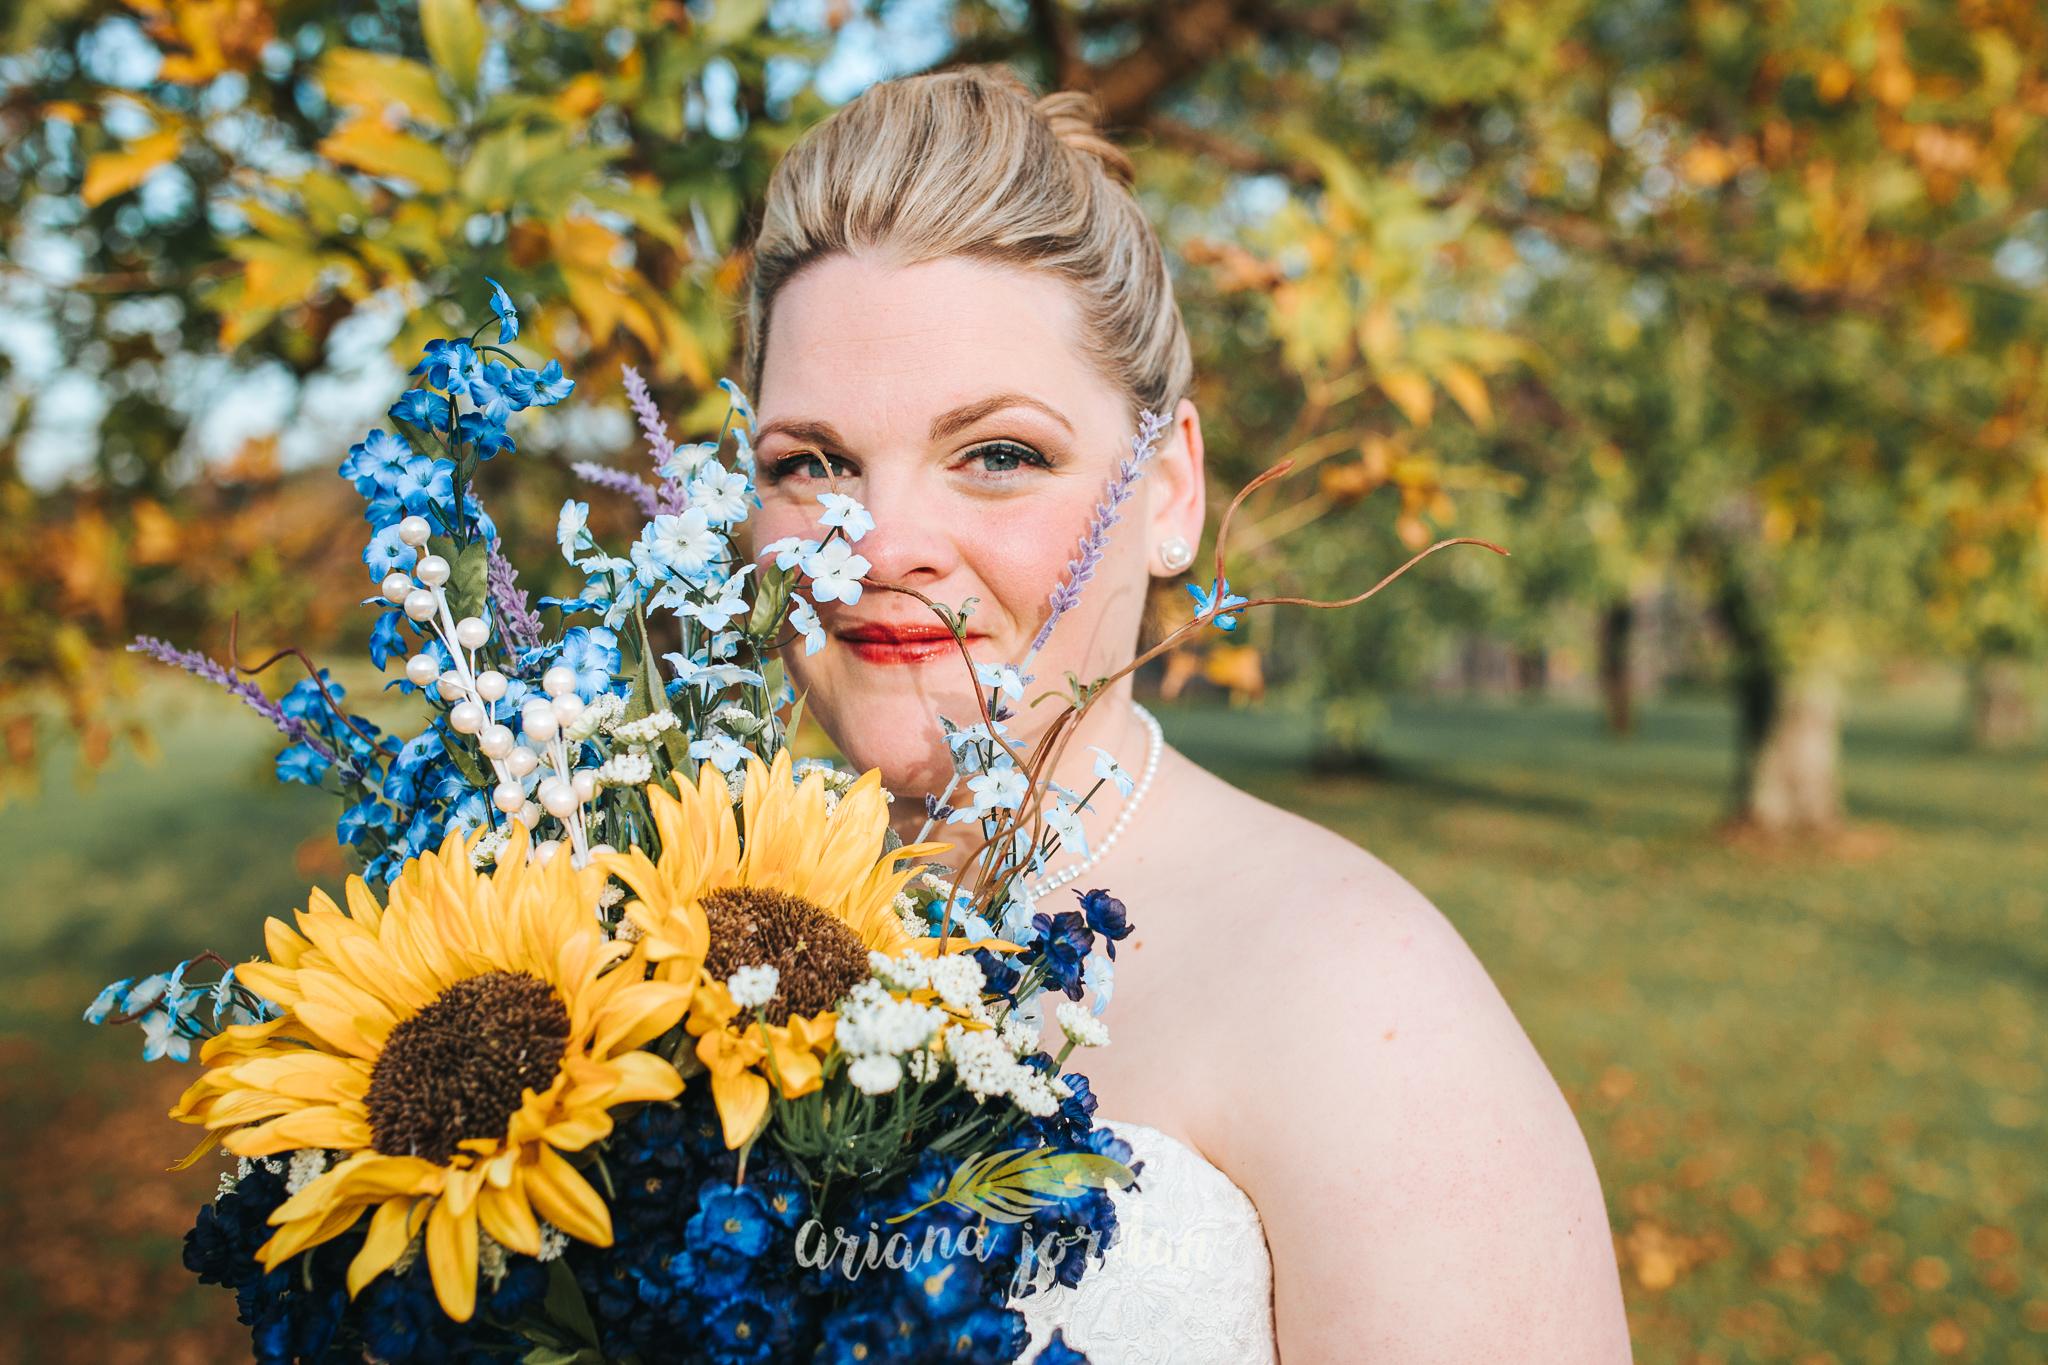 0055 Ariana Jordan Photography - Georgetown KY Wedding Photographer 8410.jpg